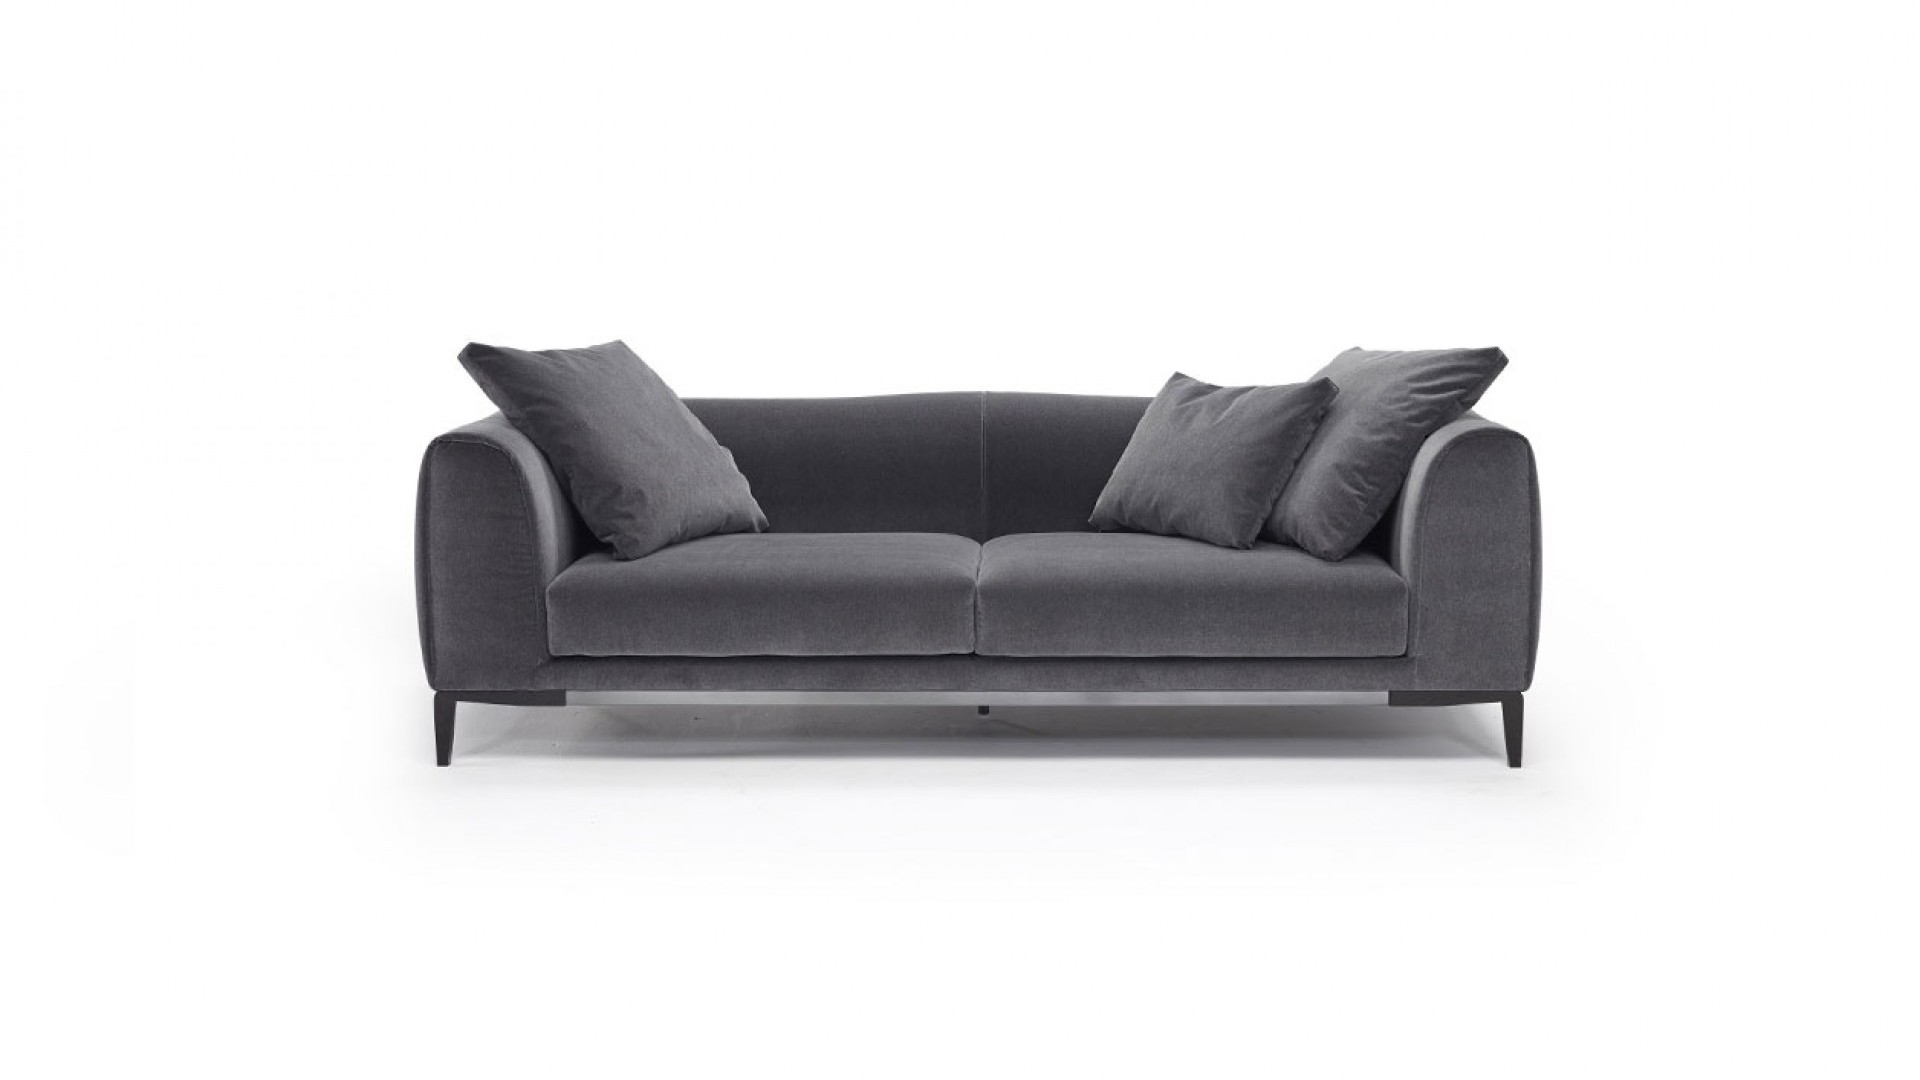 Natuzzi Microfiber Sofa Sofa Engrossing Natuzzi Microfiber Sectional Sofas Finest Thesofa